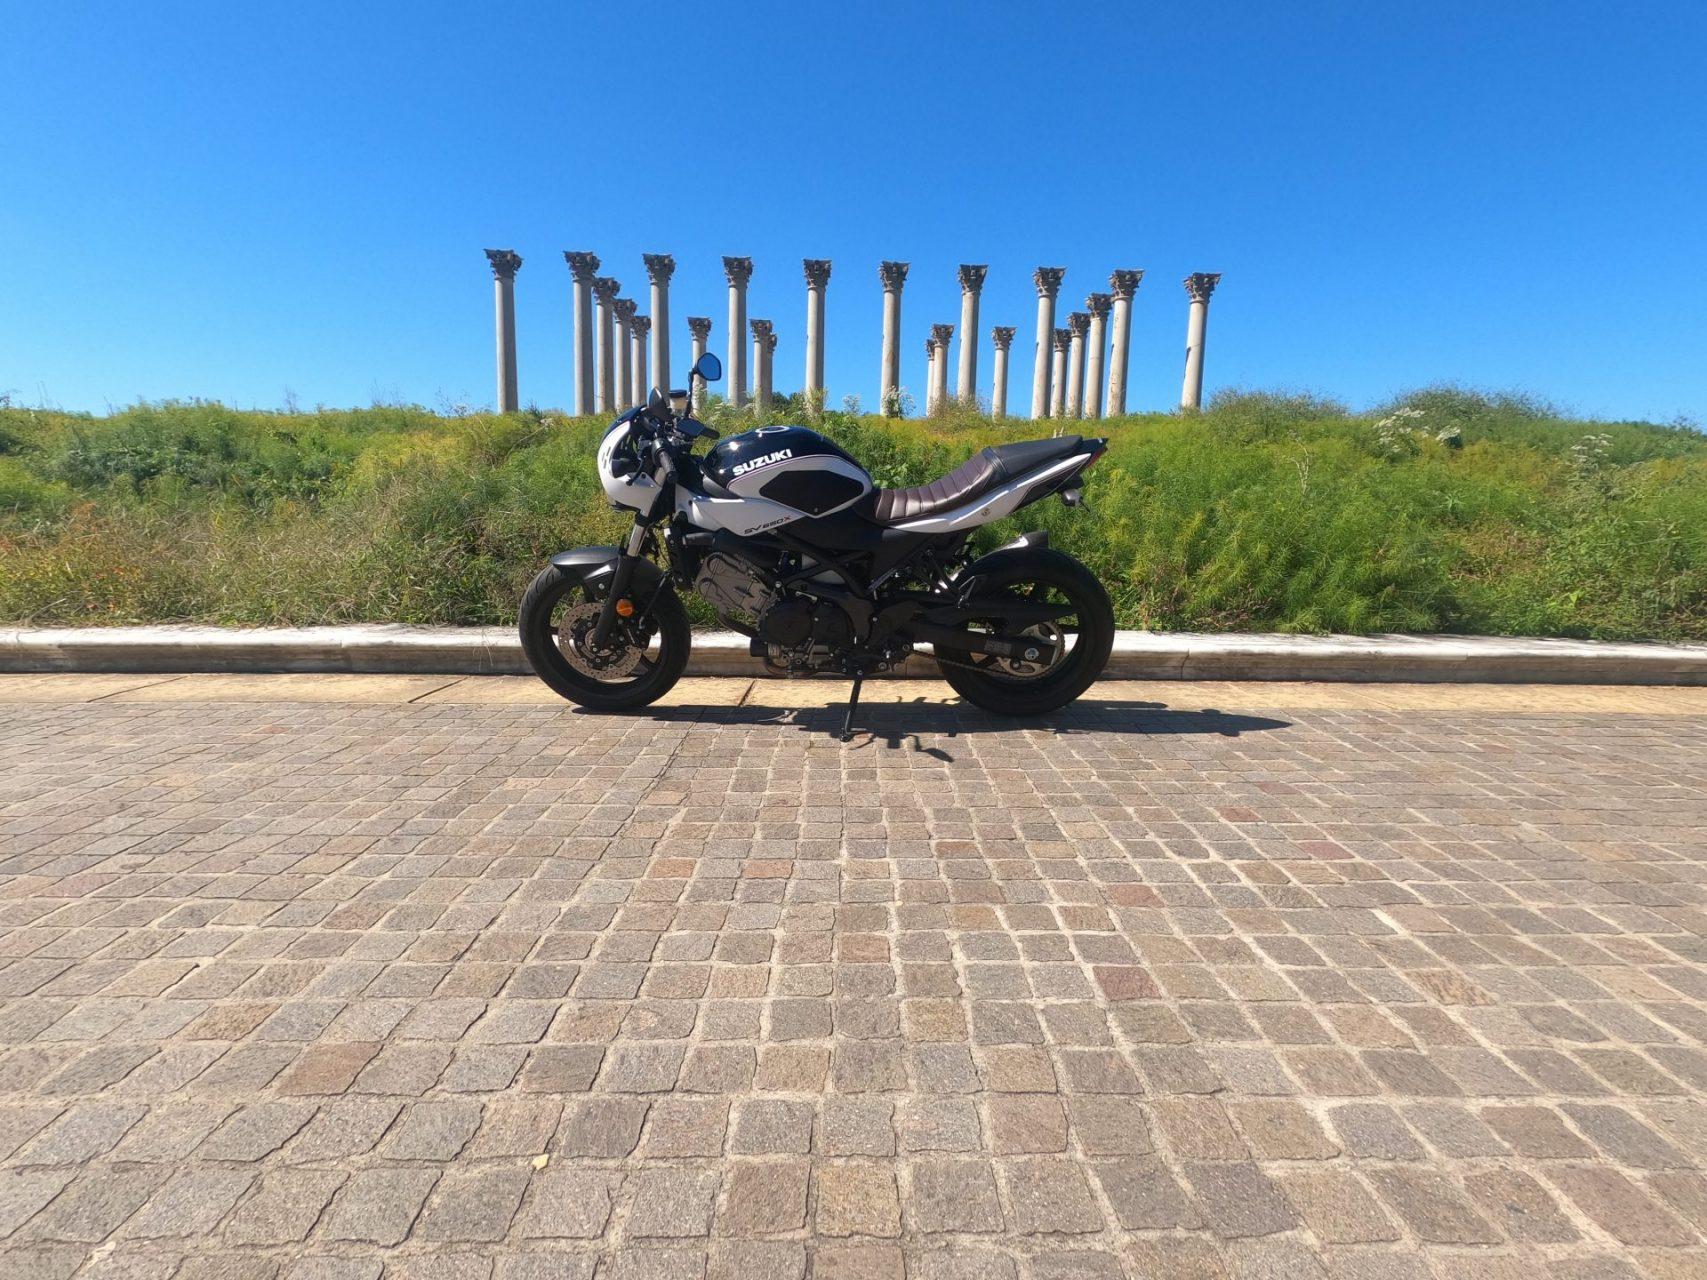 https://bikemeets.com/wp-content/uploads/2020/09/GOPR0082-scaled.jpg